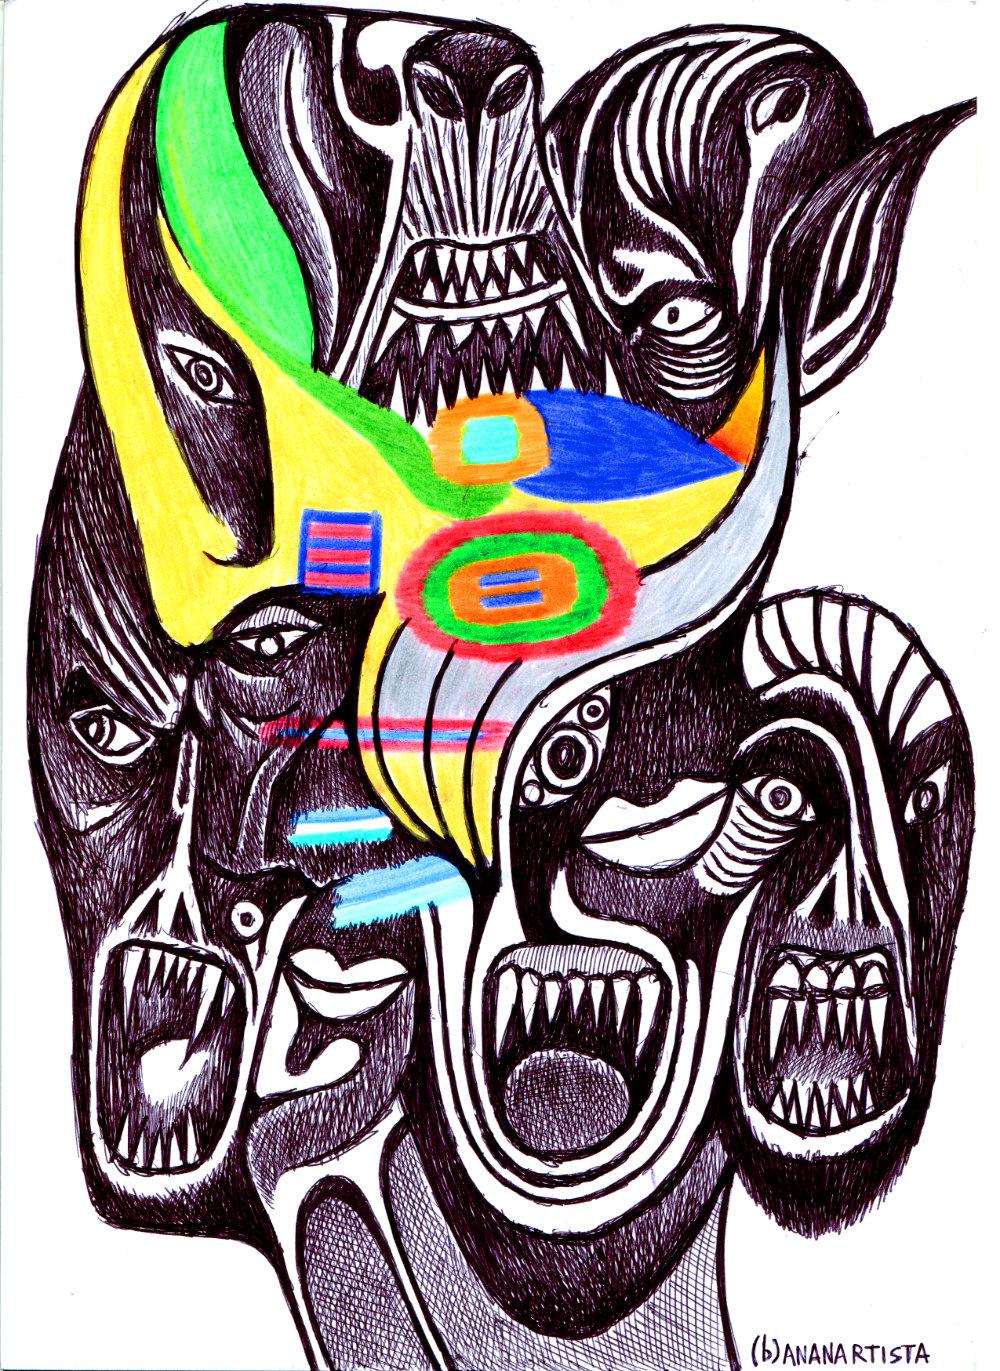 invasion of trolls 02 by (b)ananartista sbuff